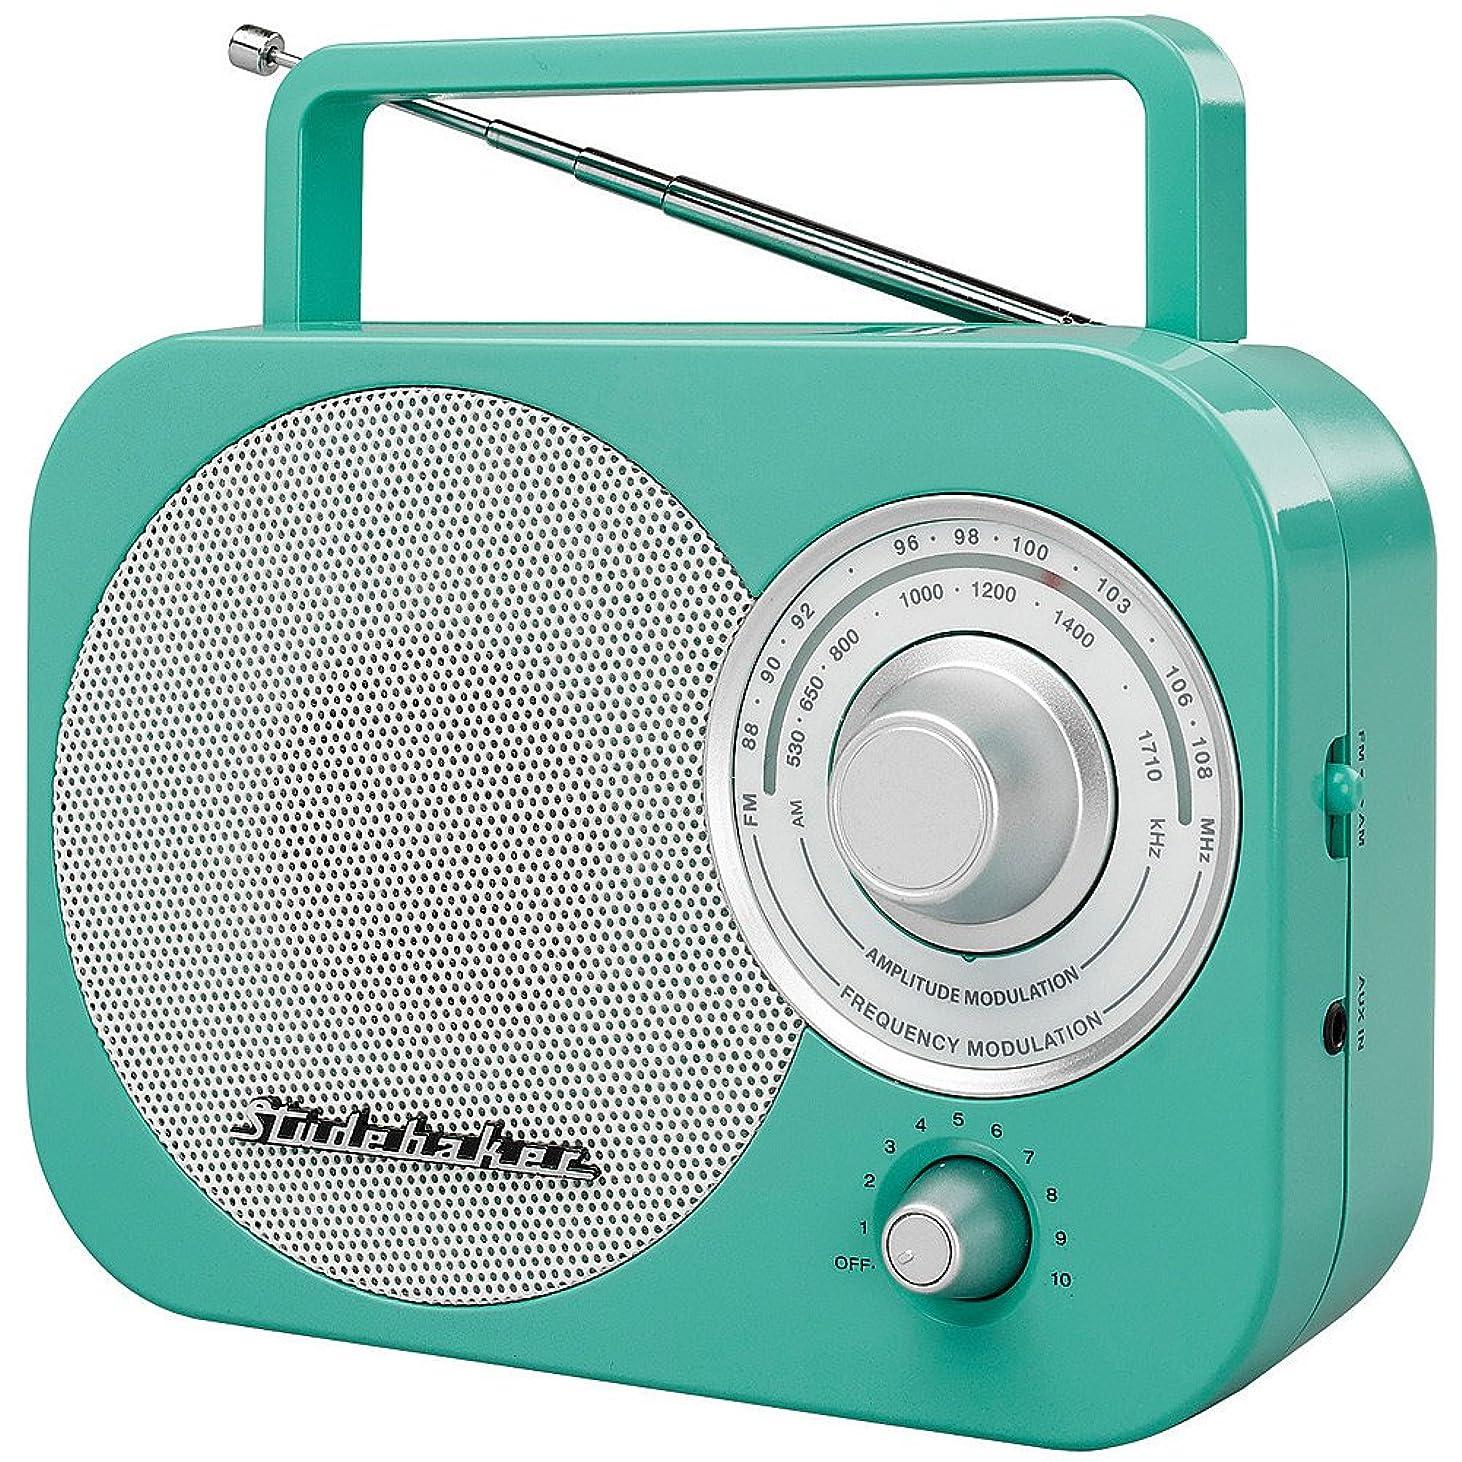 Studebaker Portable Am FM Radio Teal - SB2000 Analog Replica Retro Styled cfdjh100066